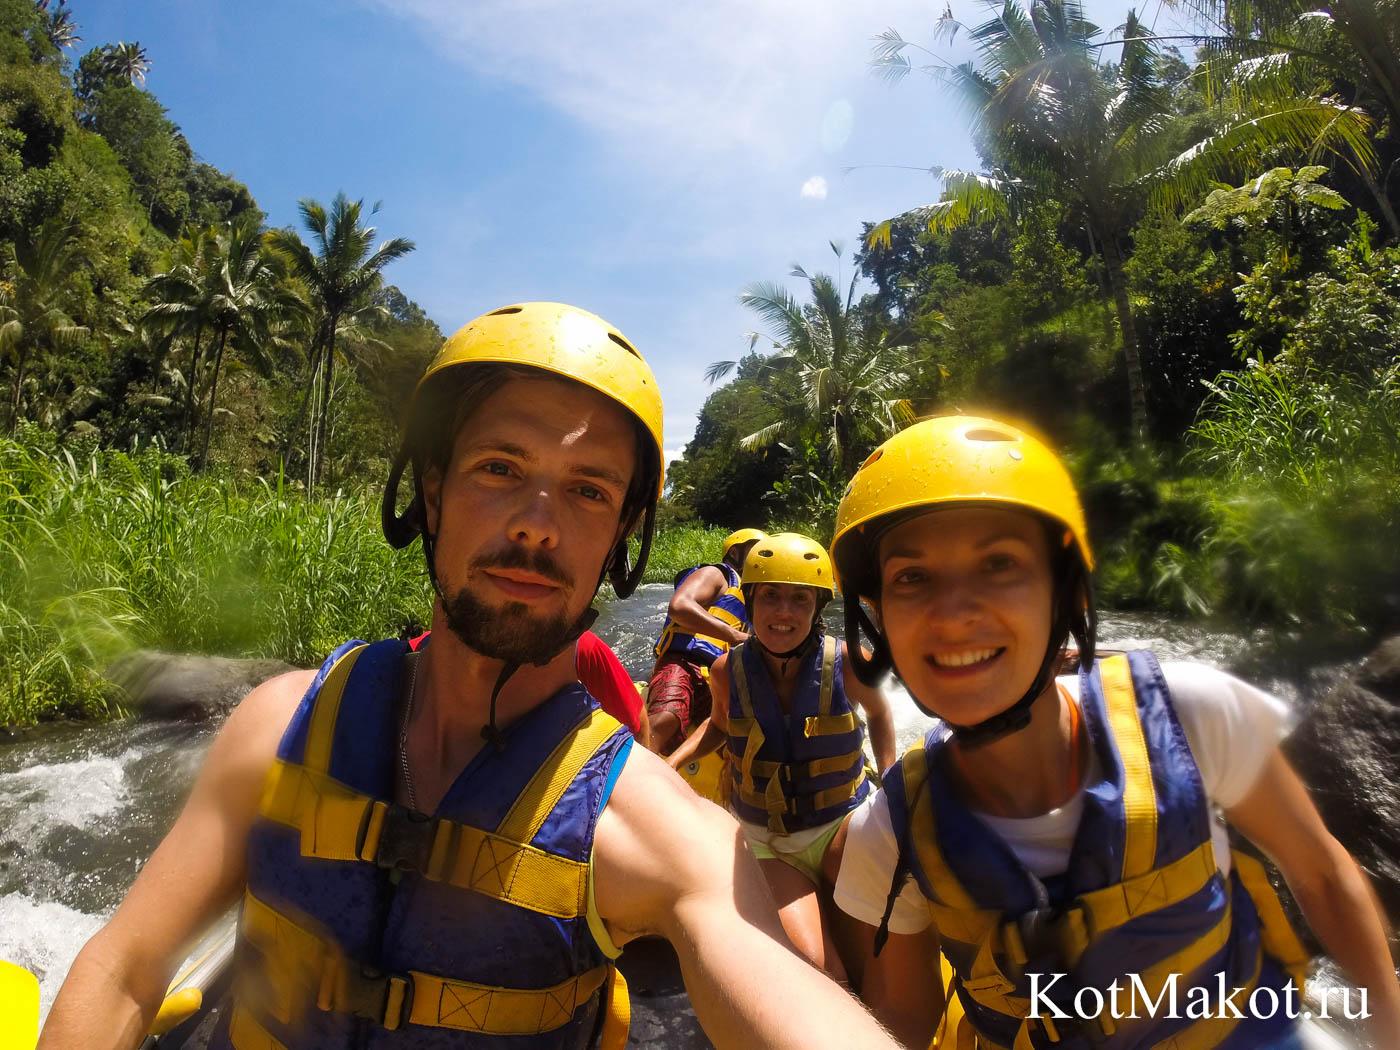 Рафинг на Бали 2015 год